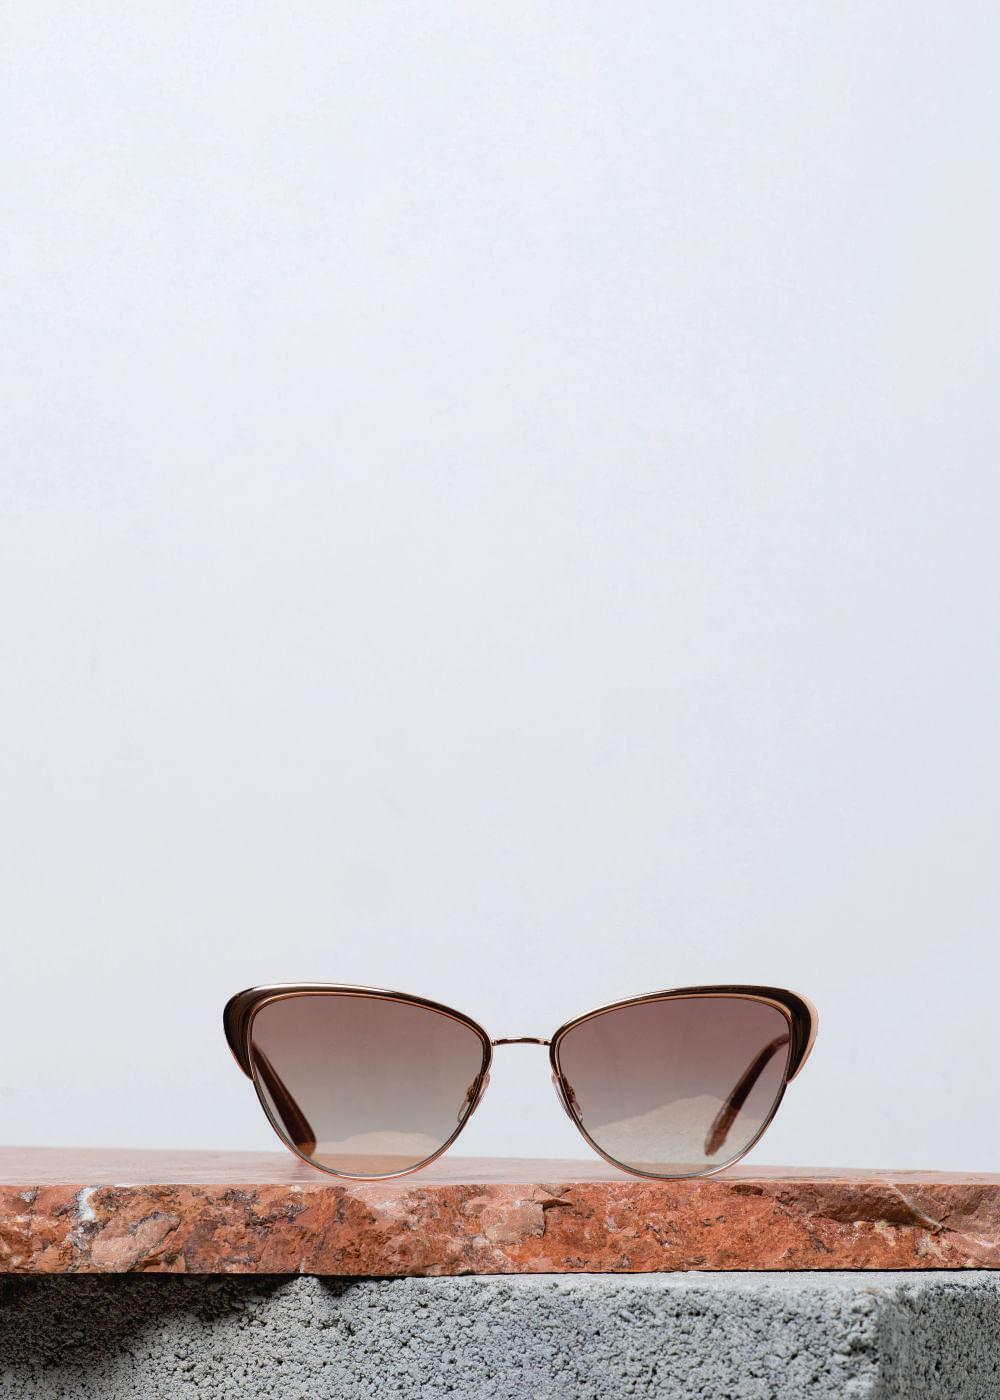 bfc0fab10 ê.moda - Acessórios - Óculos 139 – conceitoe-mobile